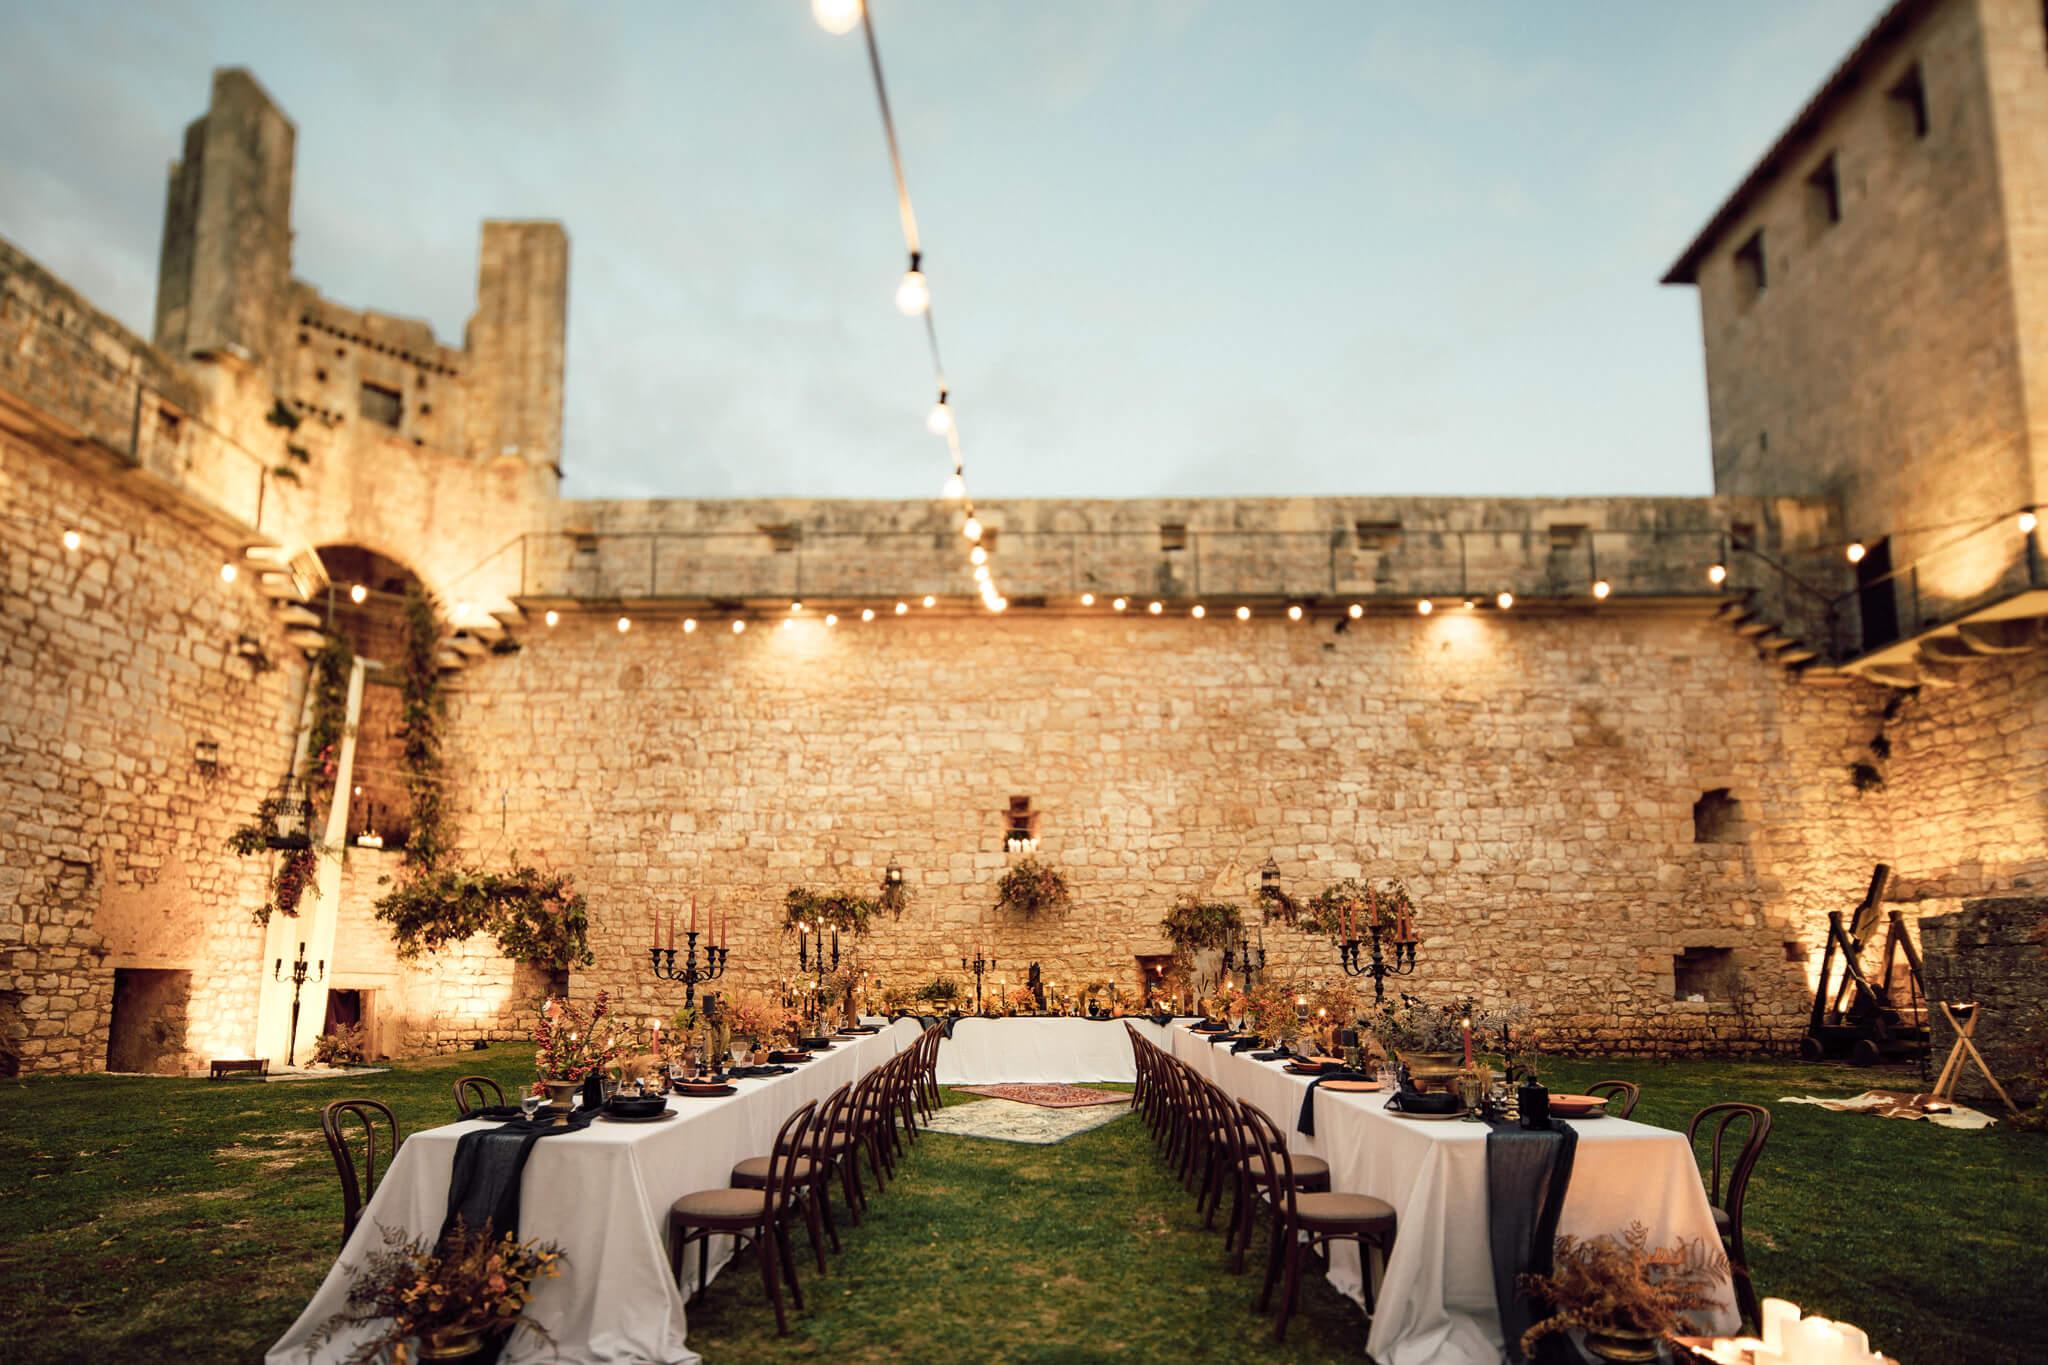 Morosini Grimani Castle